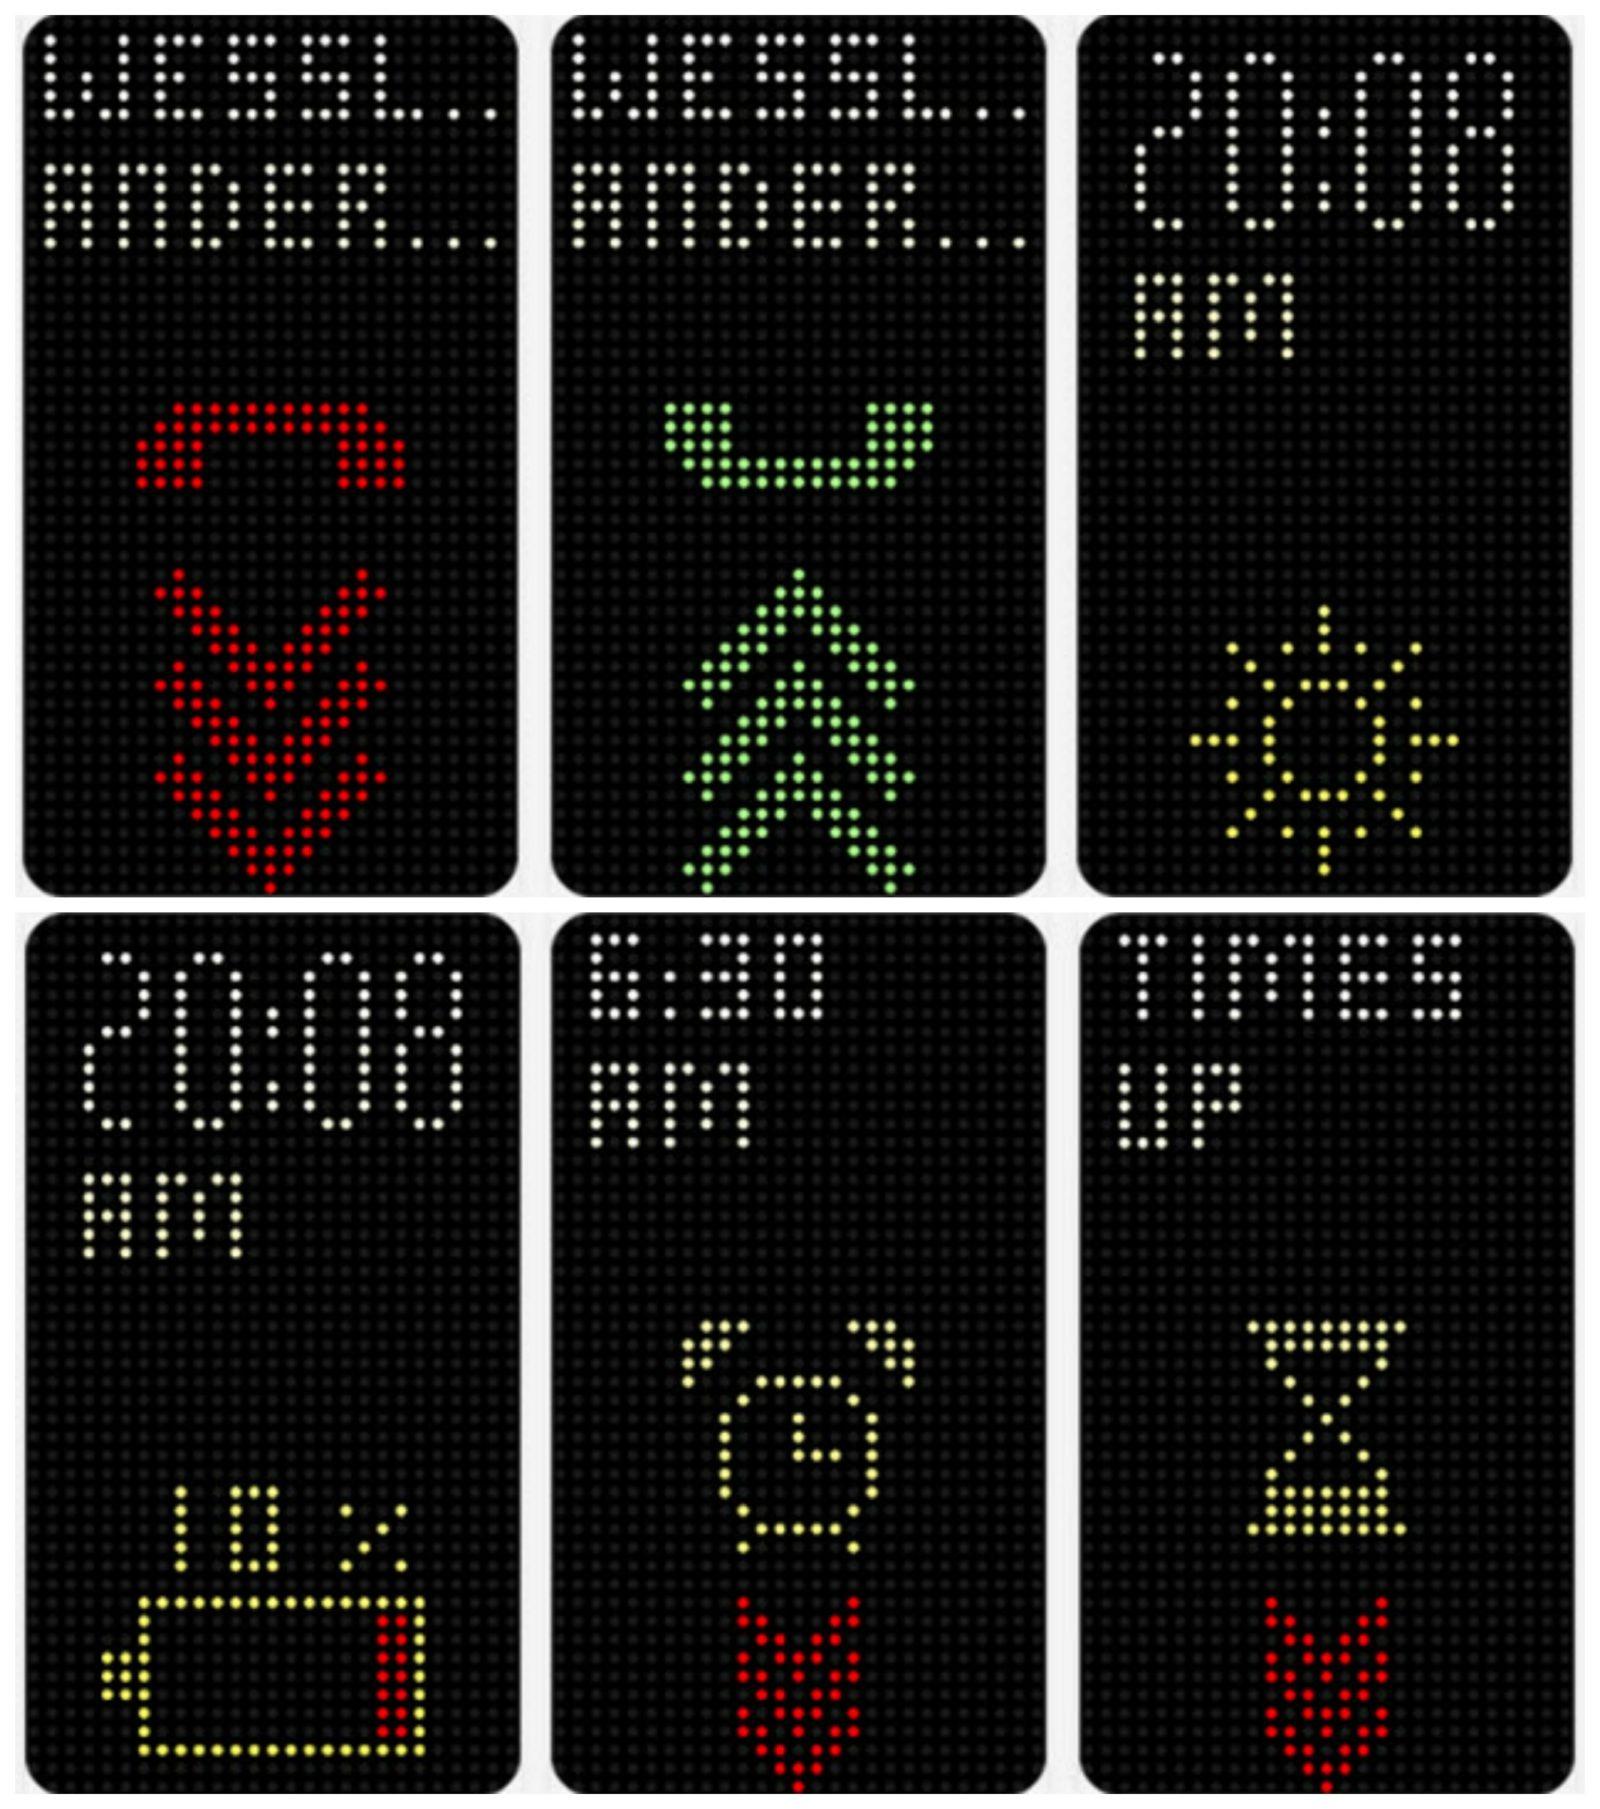 HTC Dot View Collage